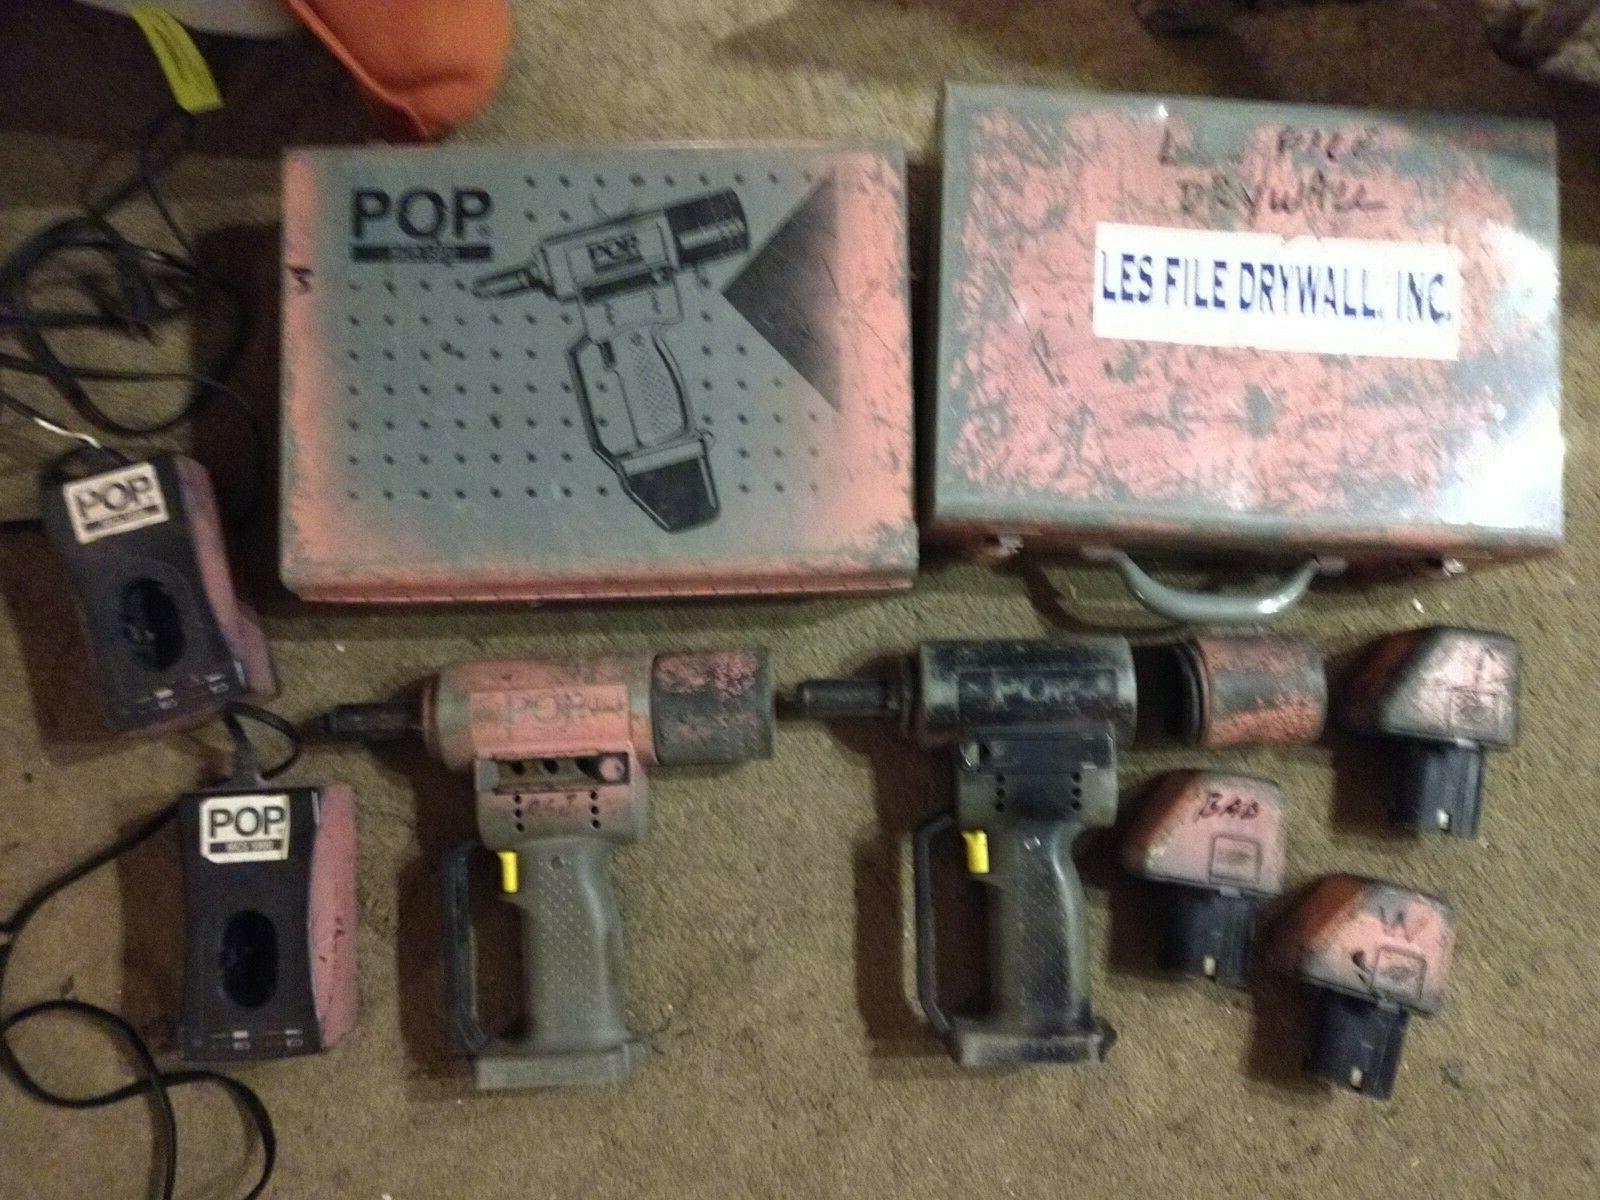 LOT POP MCS 5800 Cordless Rivet Tool Battery / Charger / Case READ  - $200.00